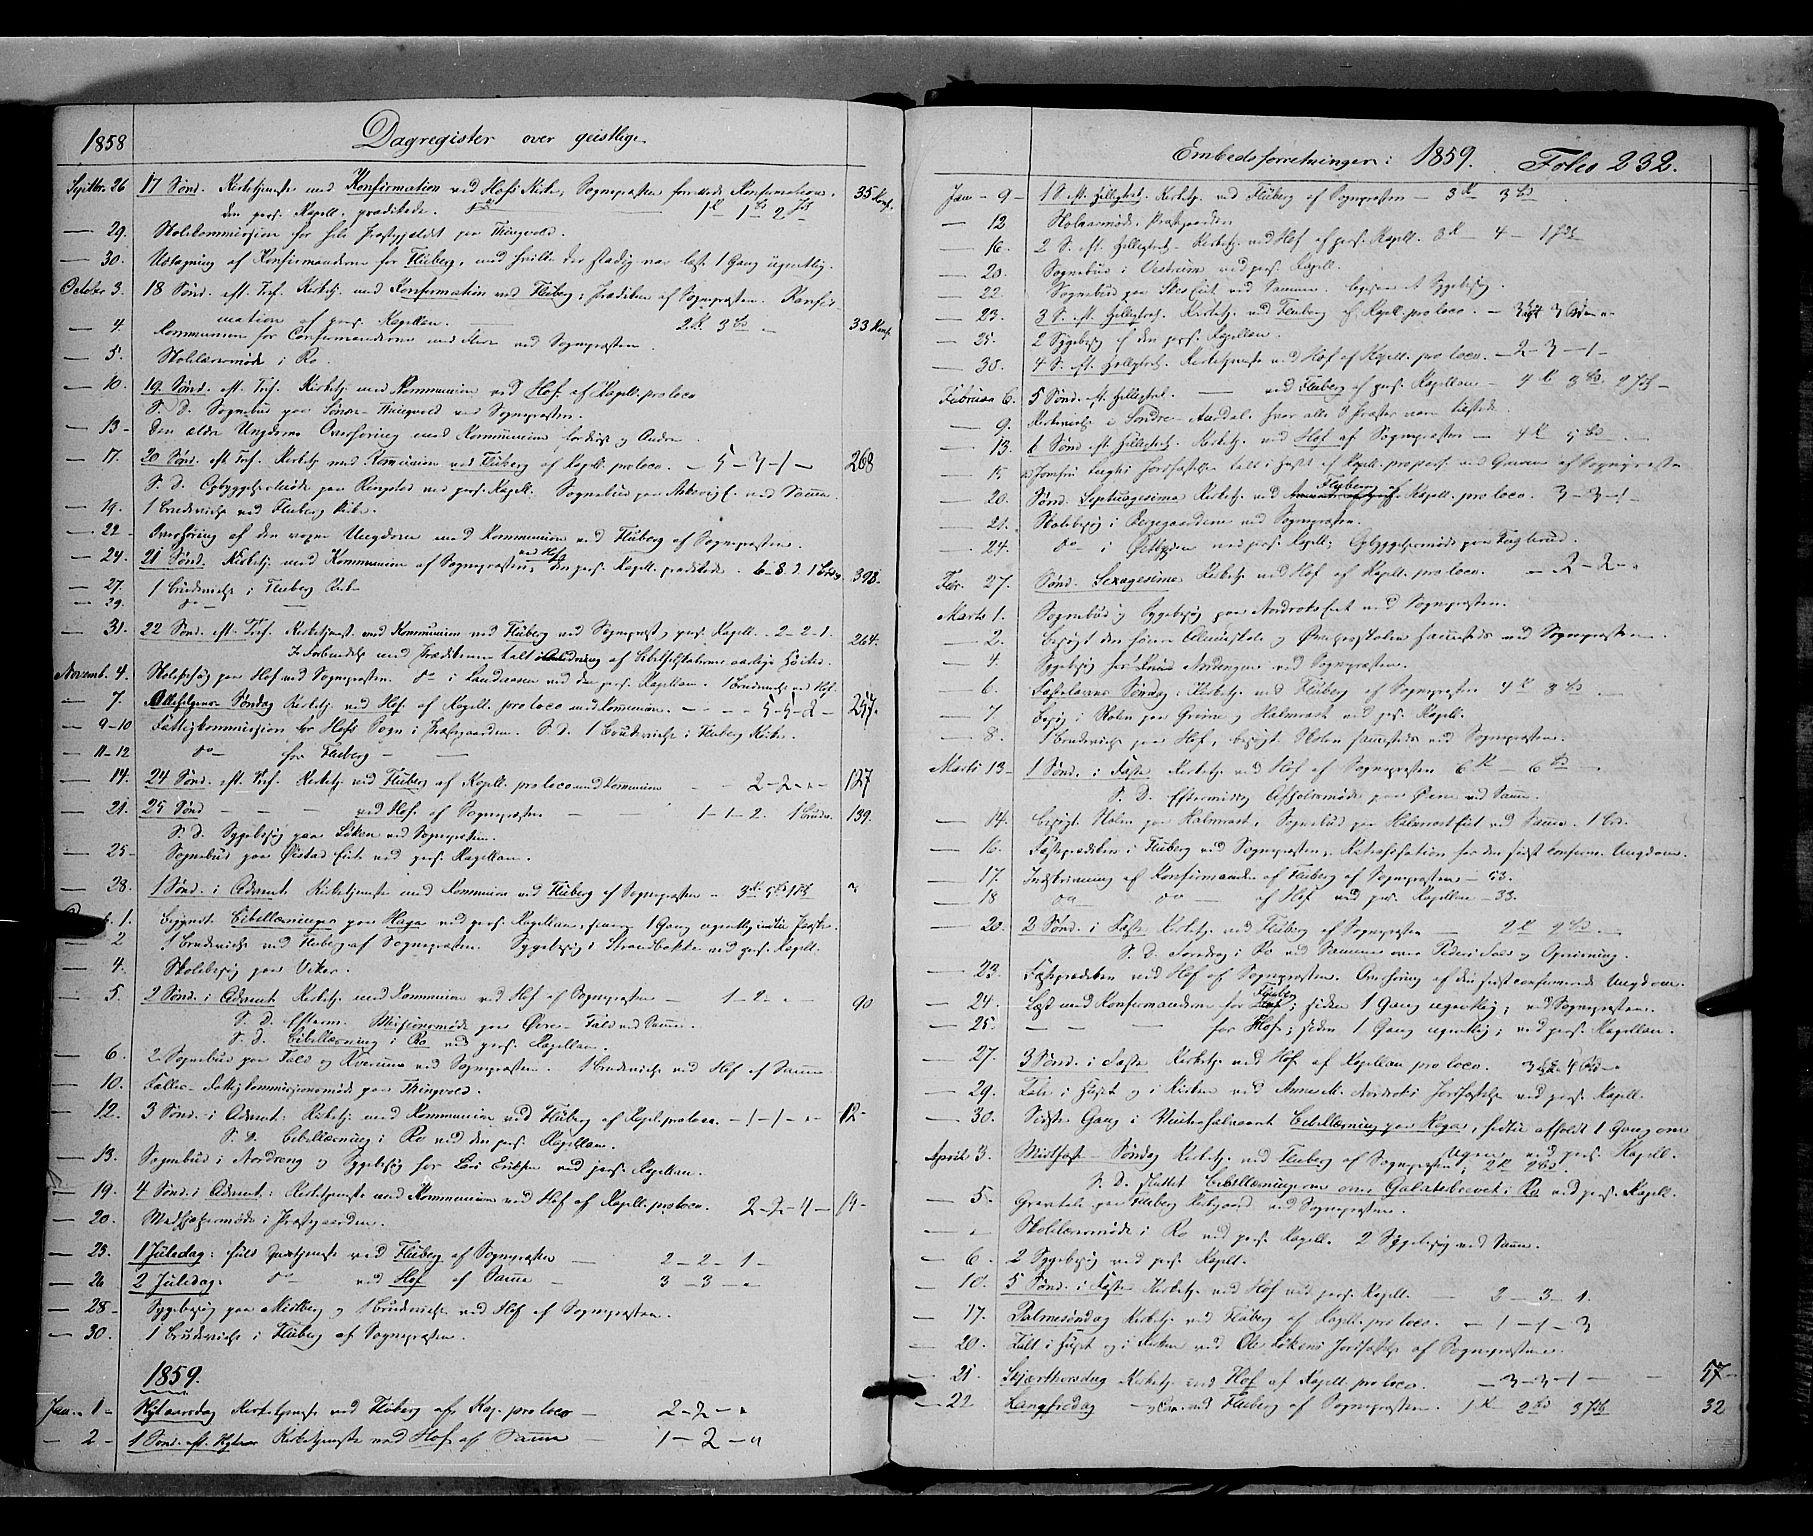 SAH, Land prestekontor, Ministerialbok nr. 9, 1847-1859, s. 232